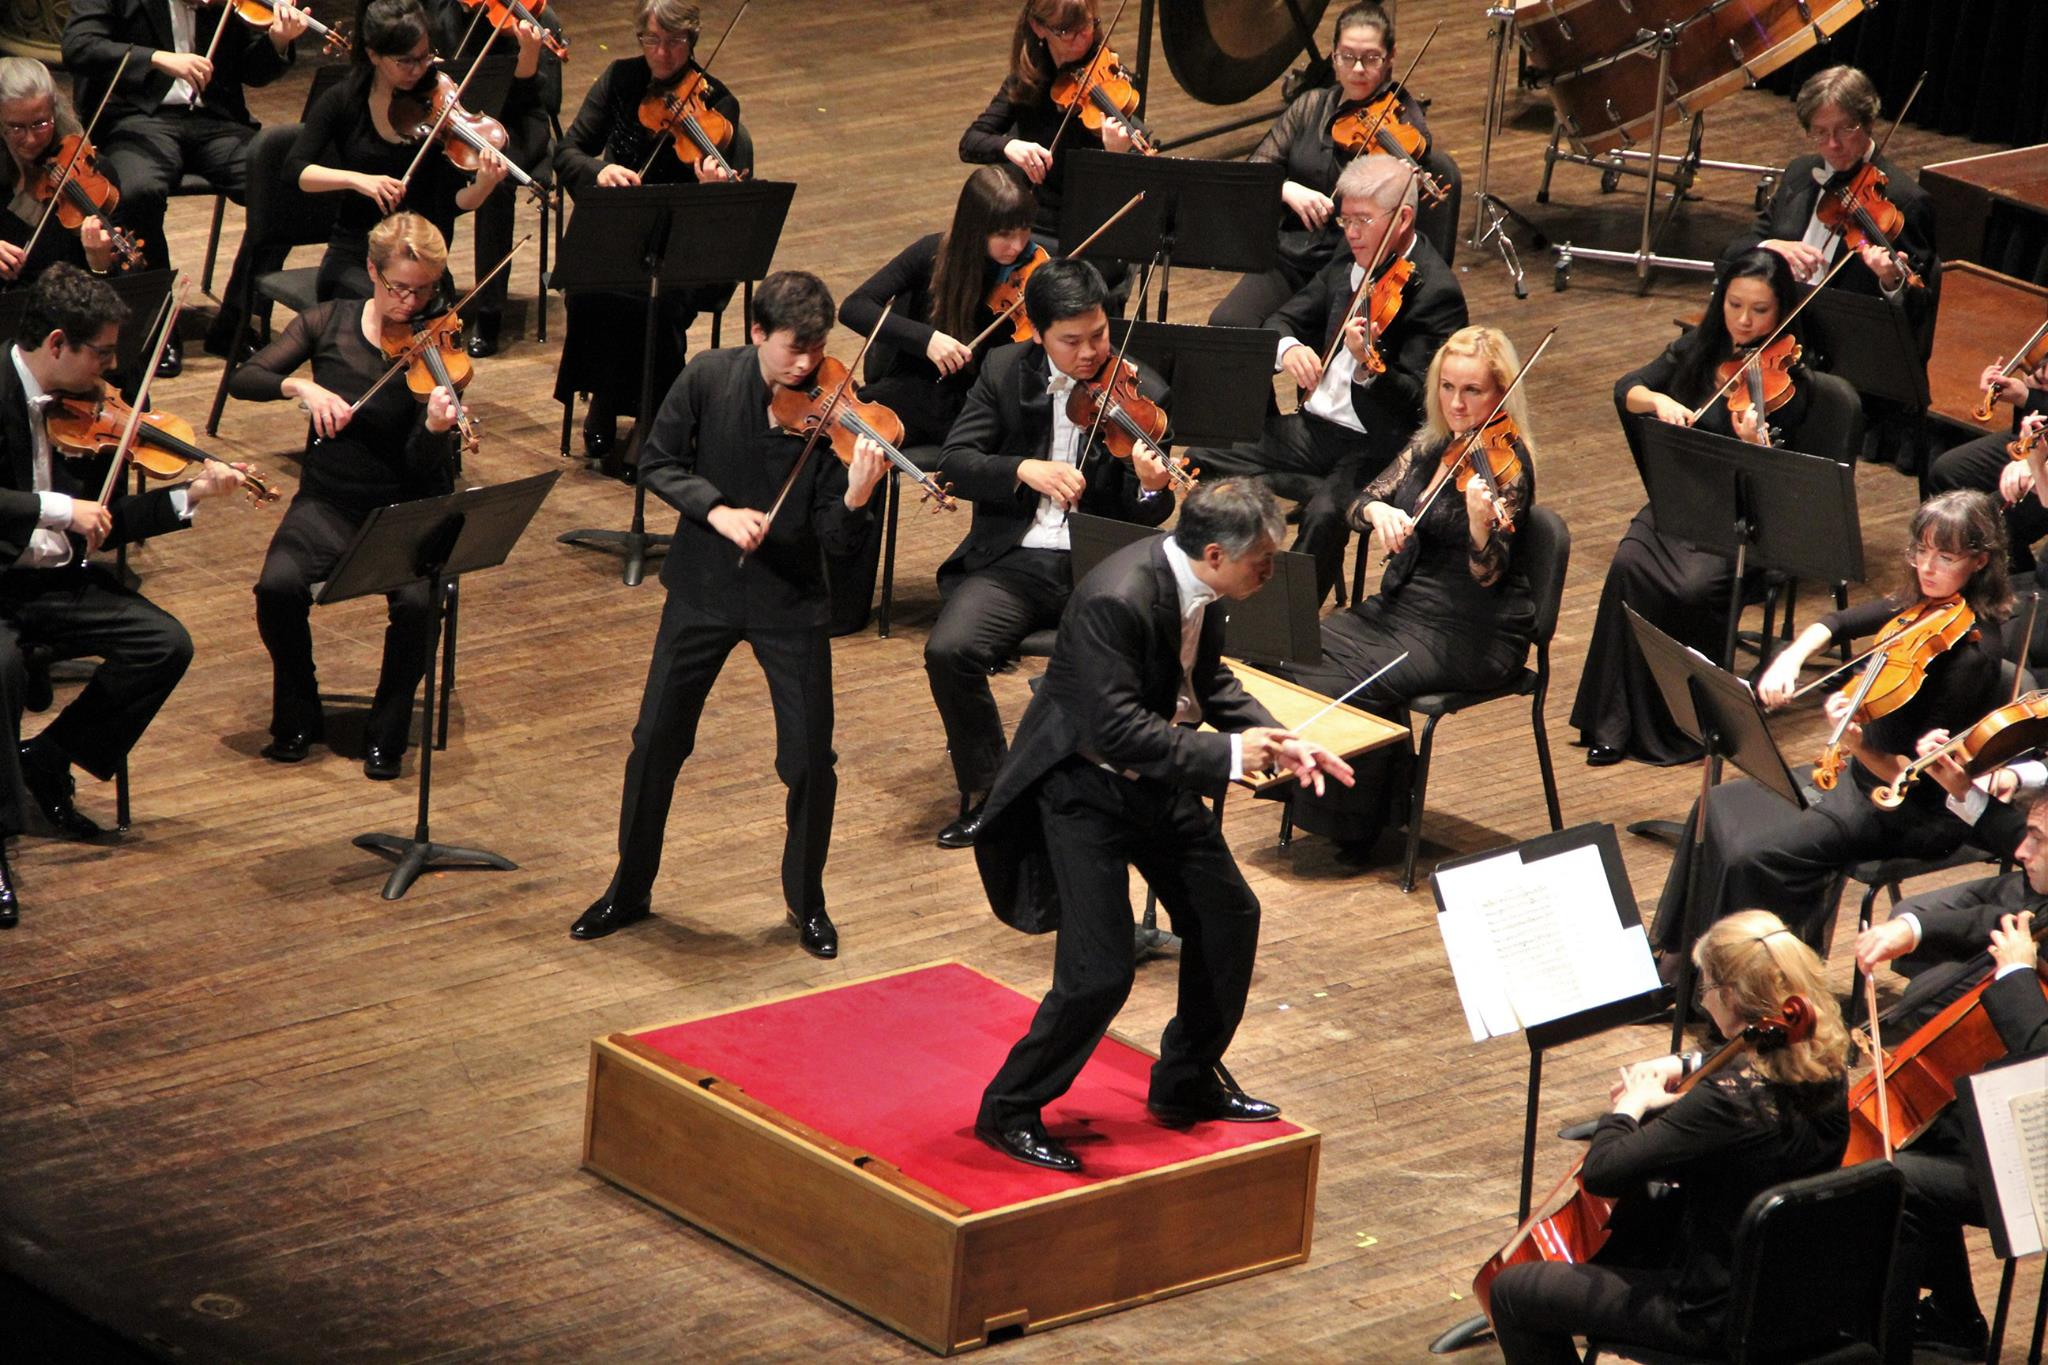 Photos Courtesy of Vancouver Symphony Orchestra